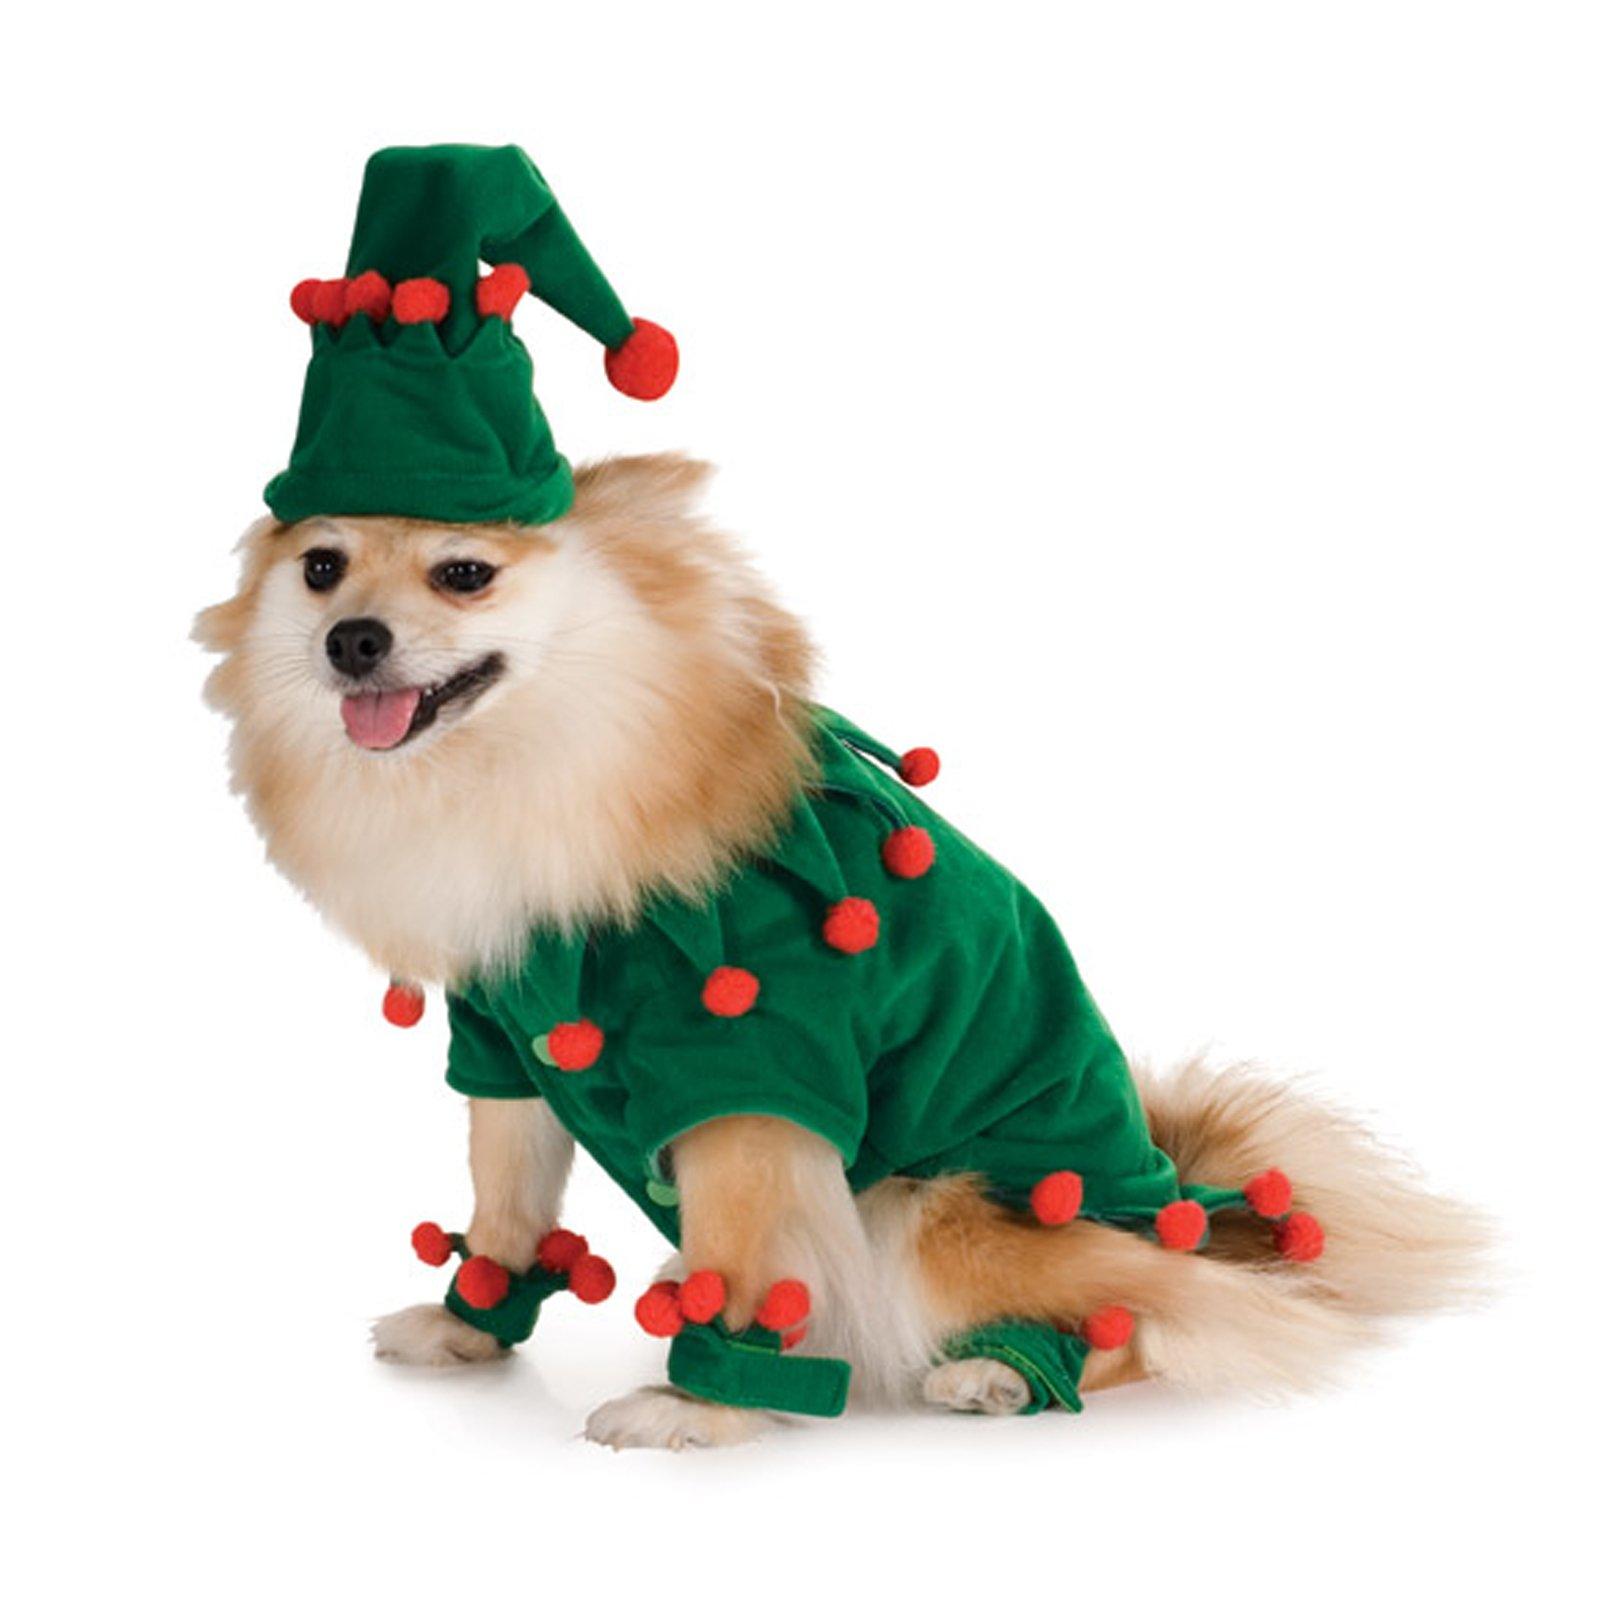 Christmas Pet Costume photo - 1